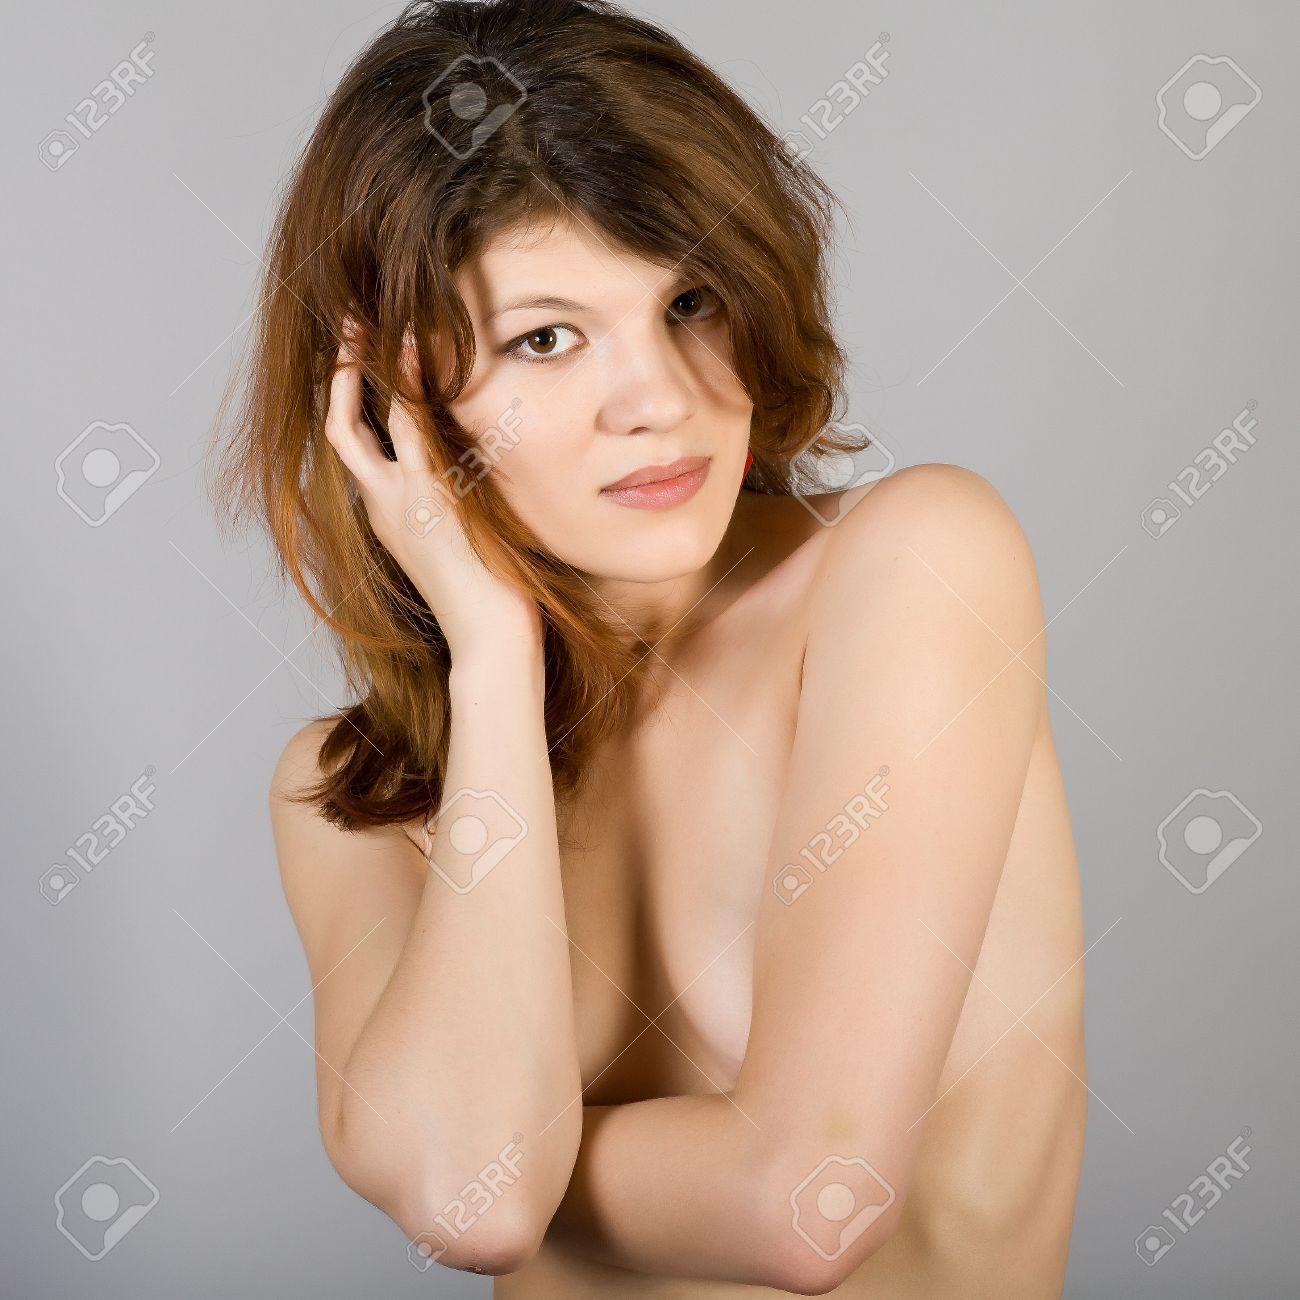 Sister porn movies free